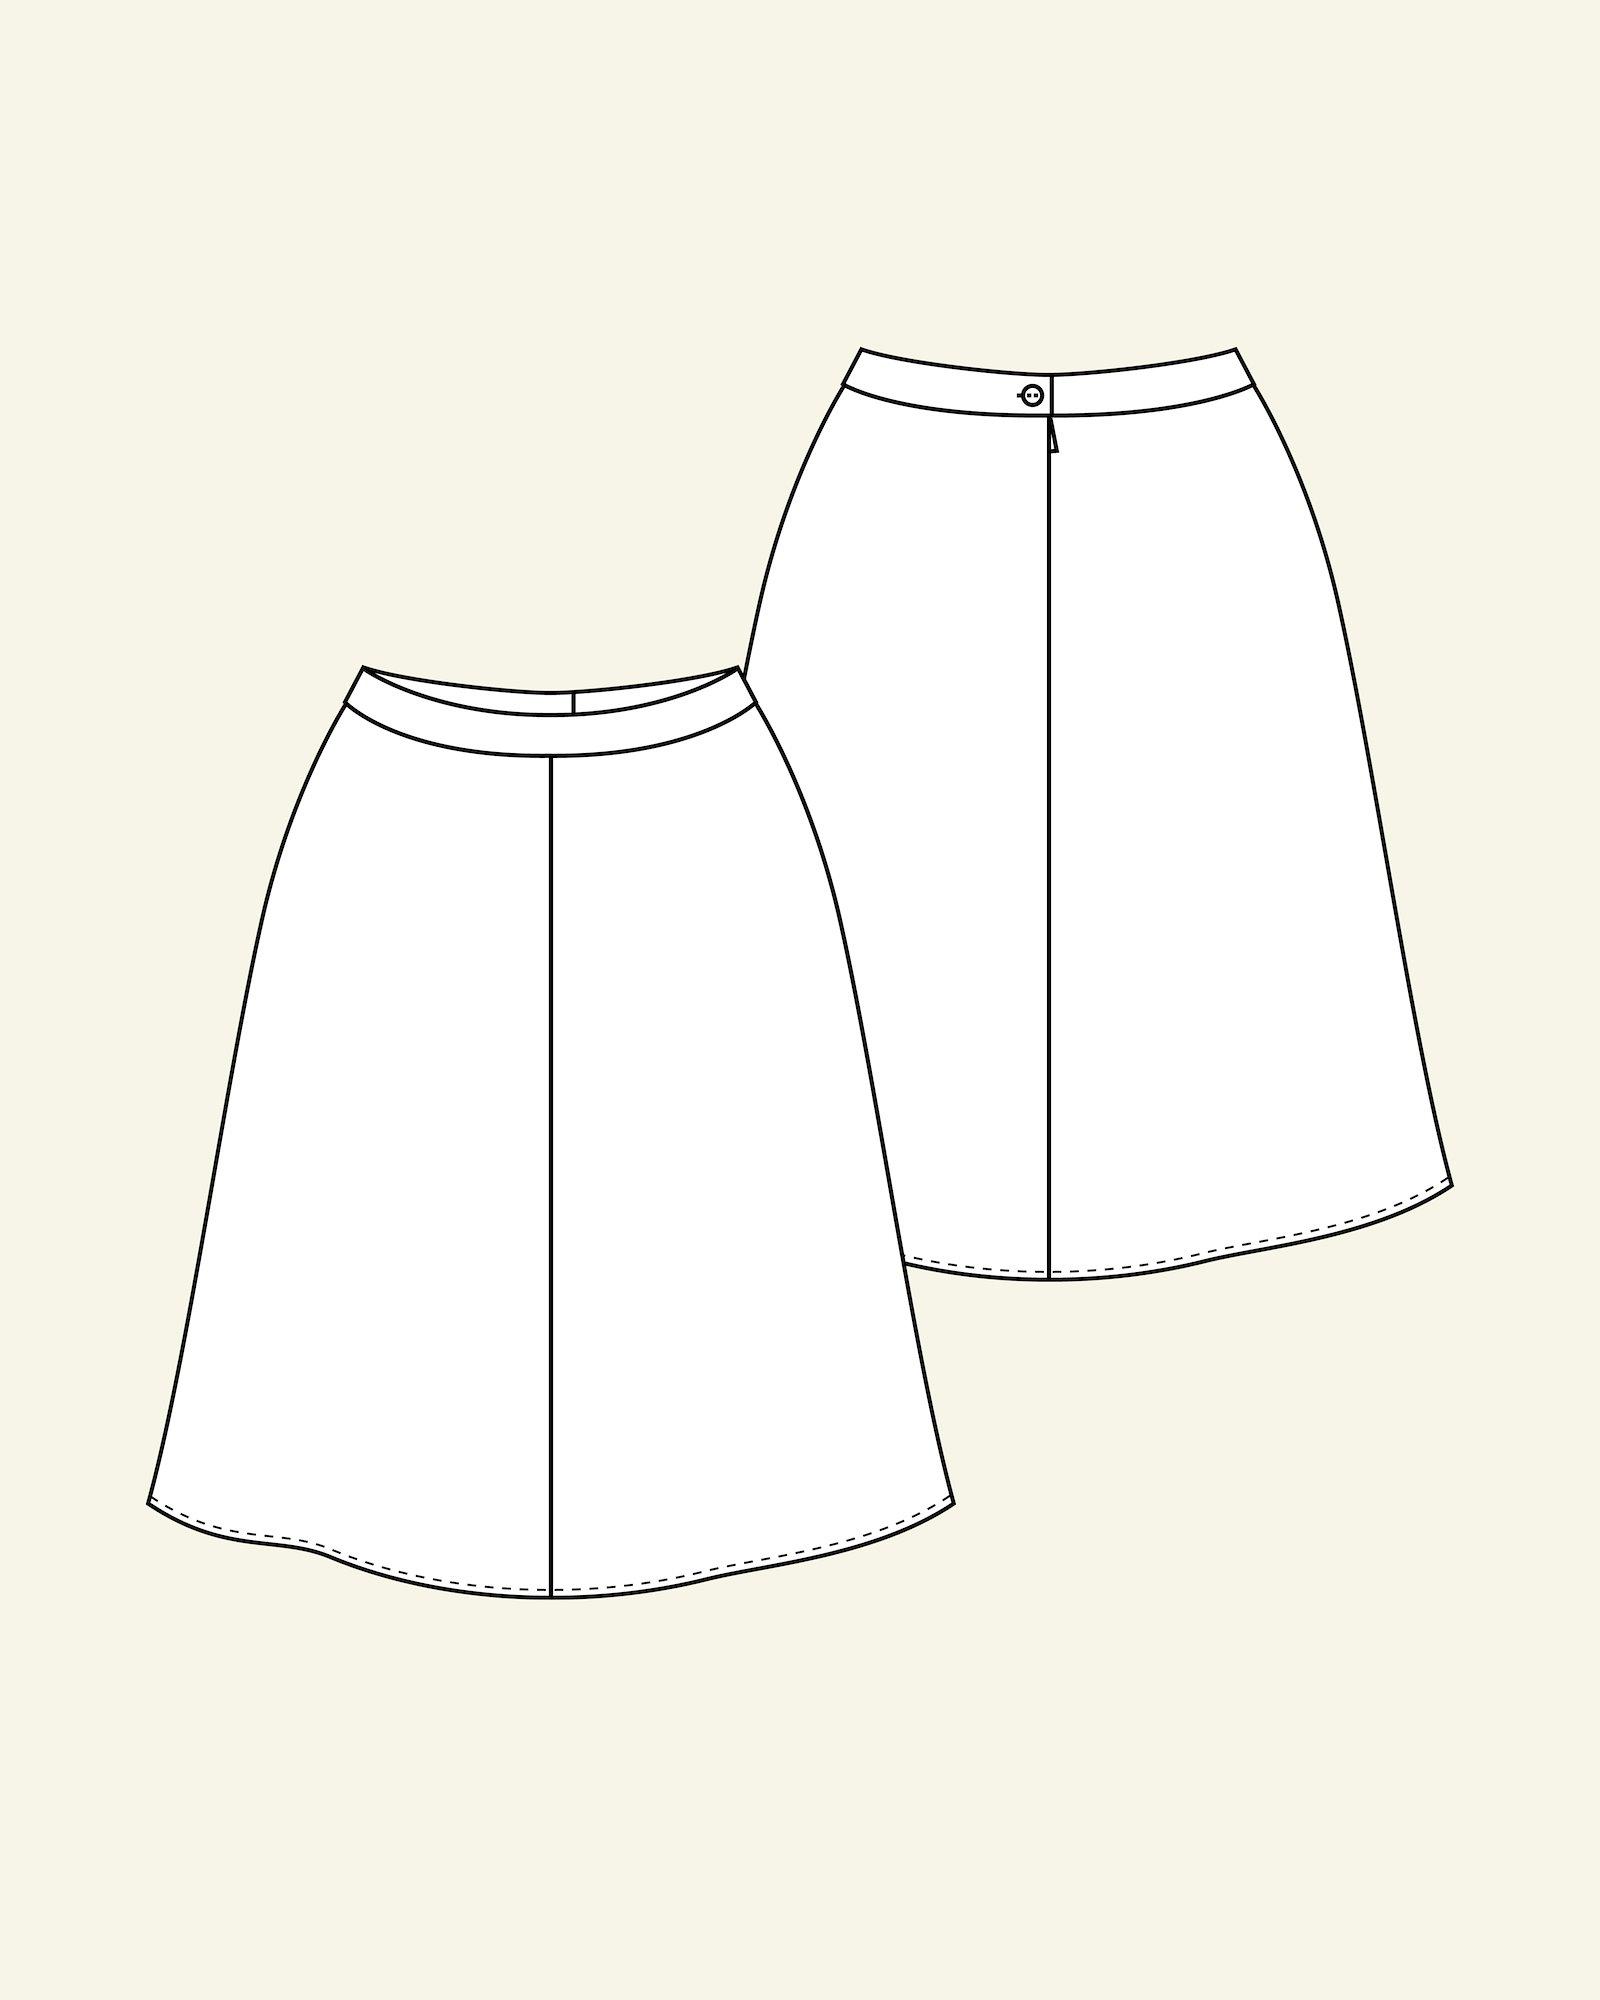 Skirt with A-shape